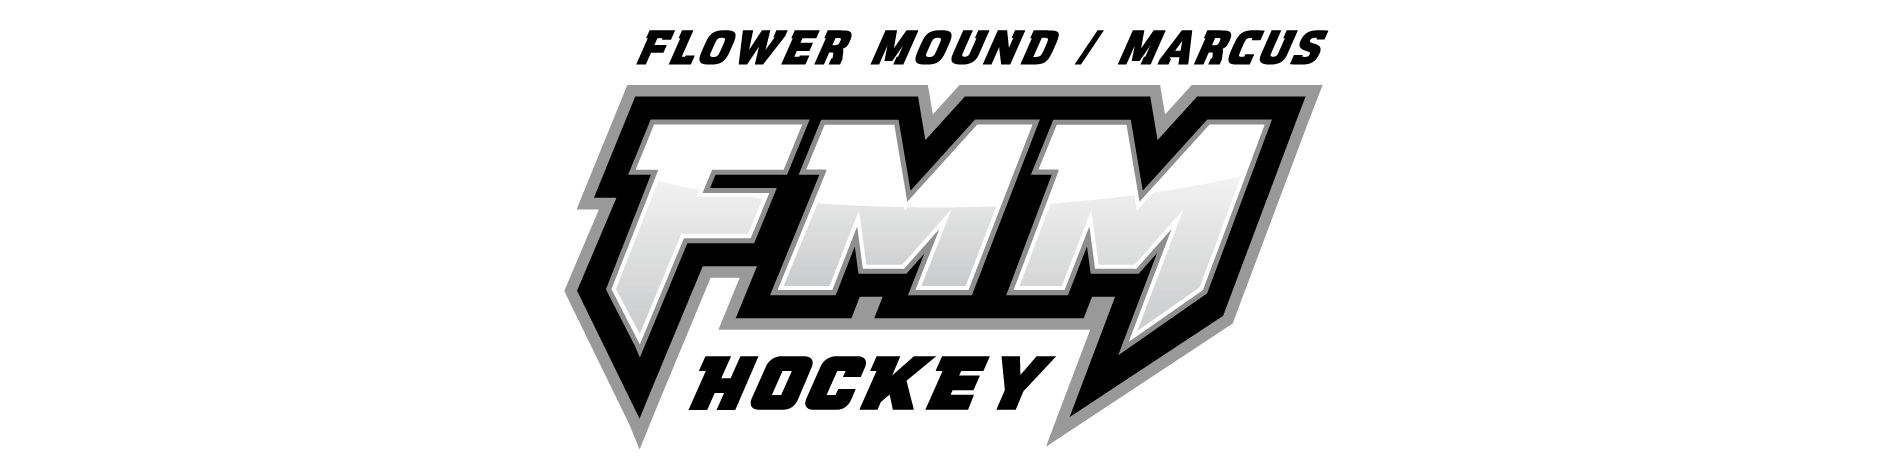 Fmm web banner